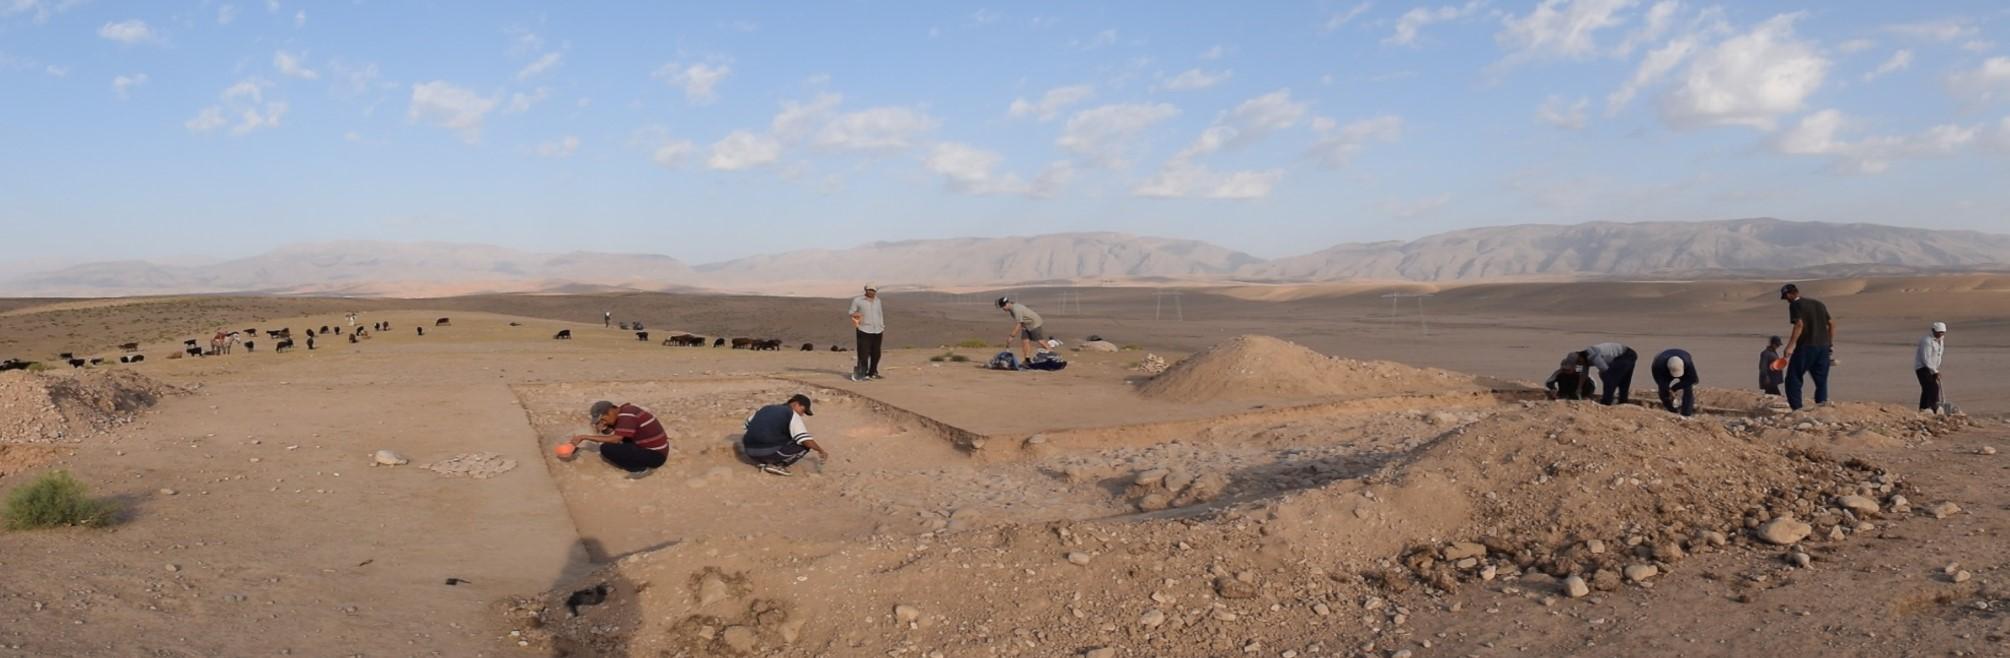 Výzkum lokality Iskandartepa